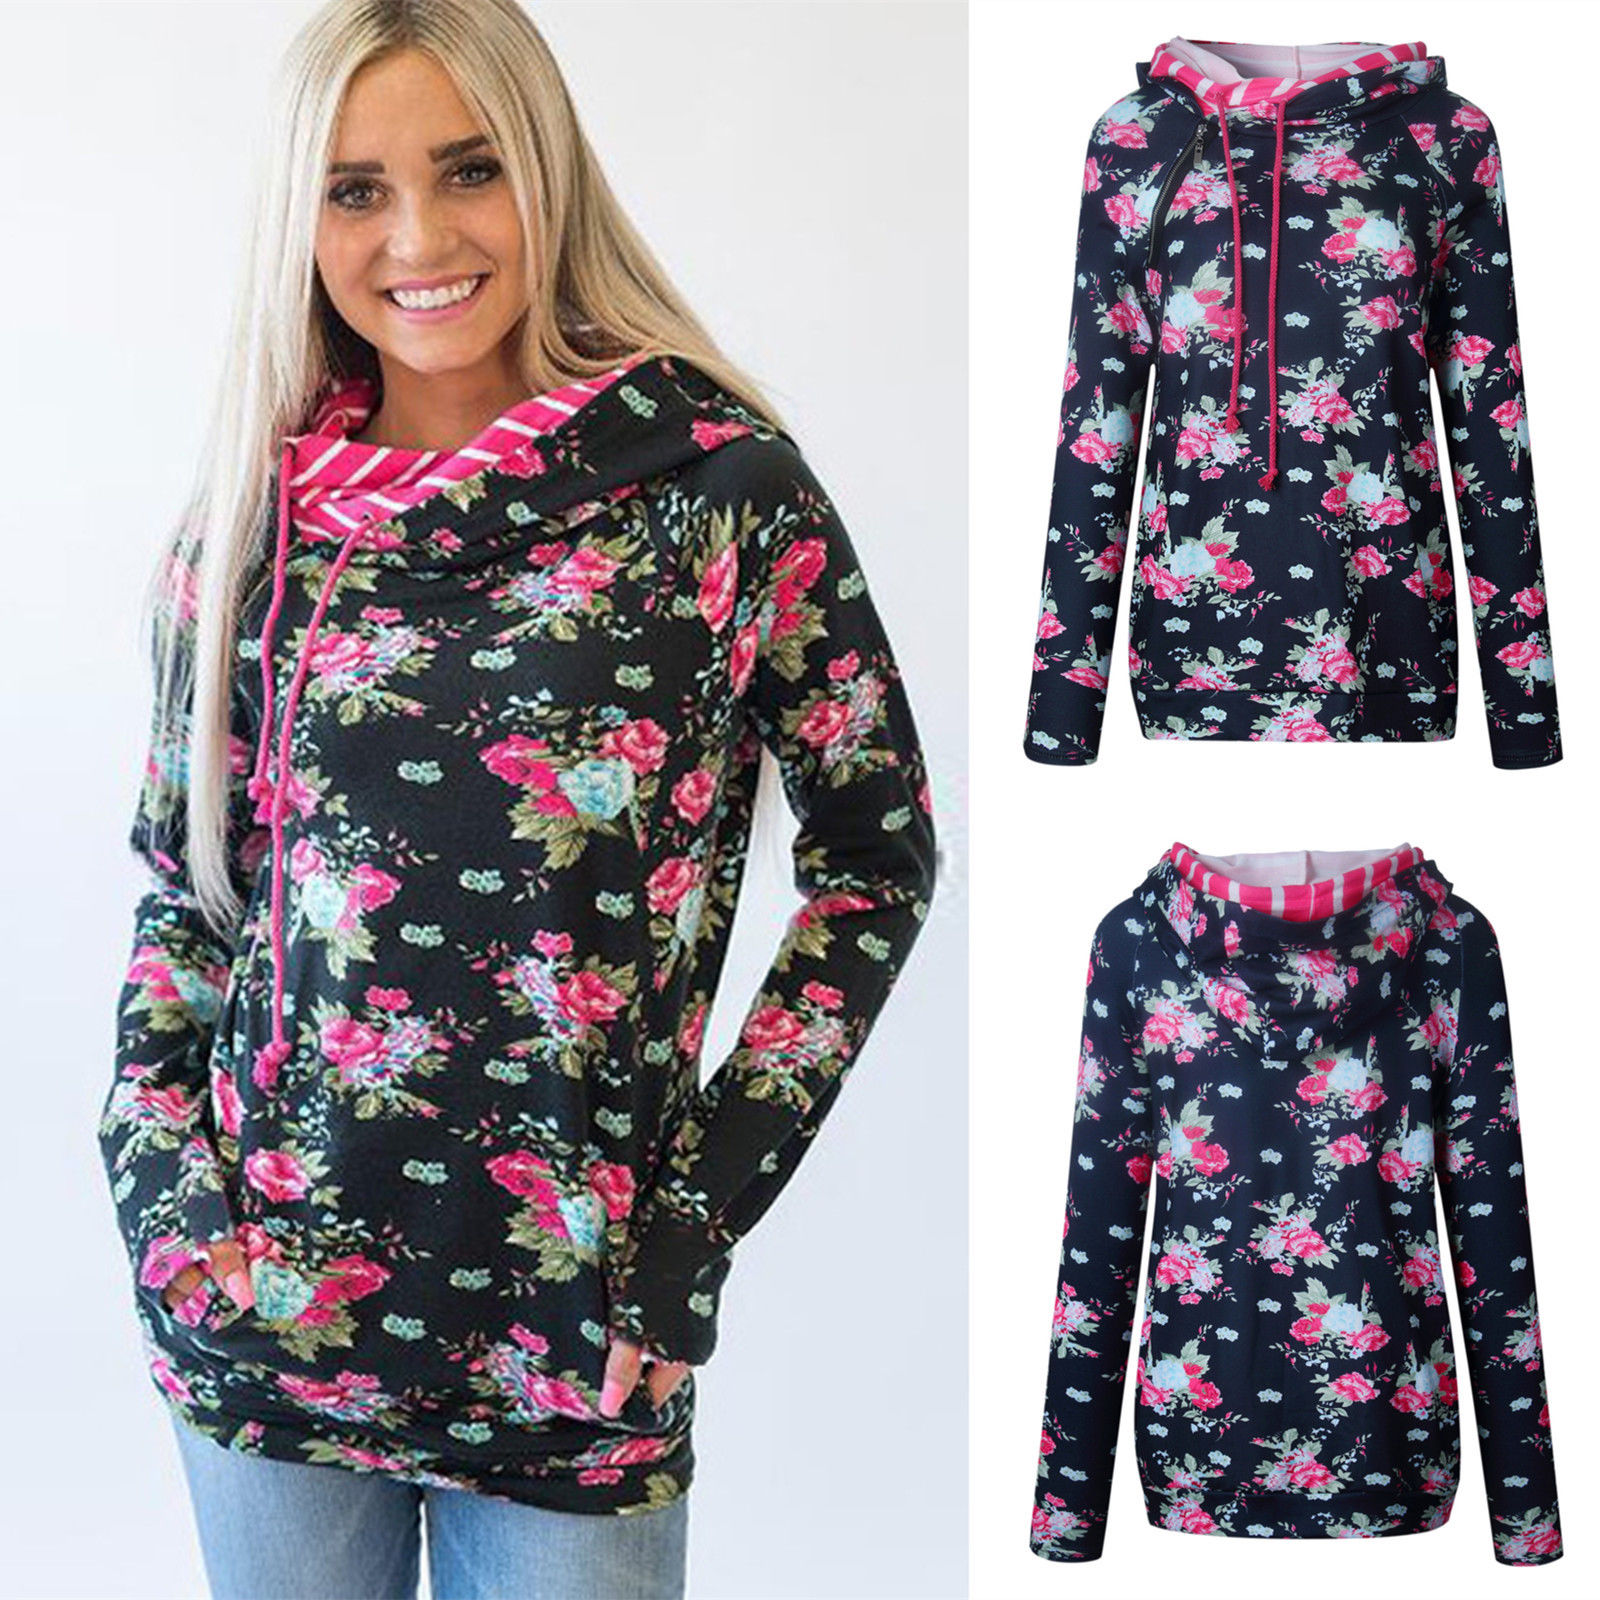 New Fashion Women Ladies Long Sleeve Floral Printed Hooded Hoodies Tops Casual Autumn Wamer Loose Women Hoodies